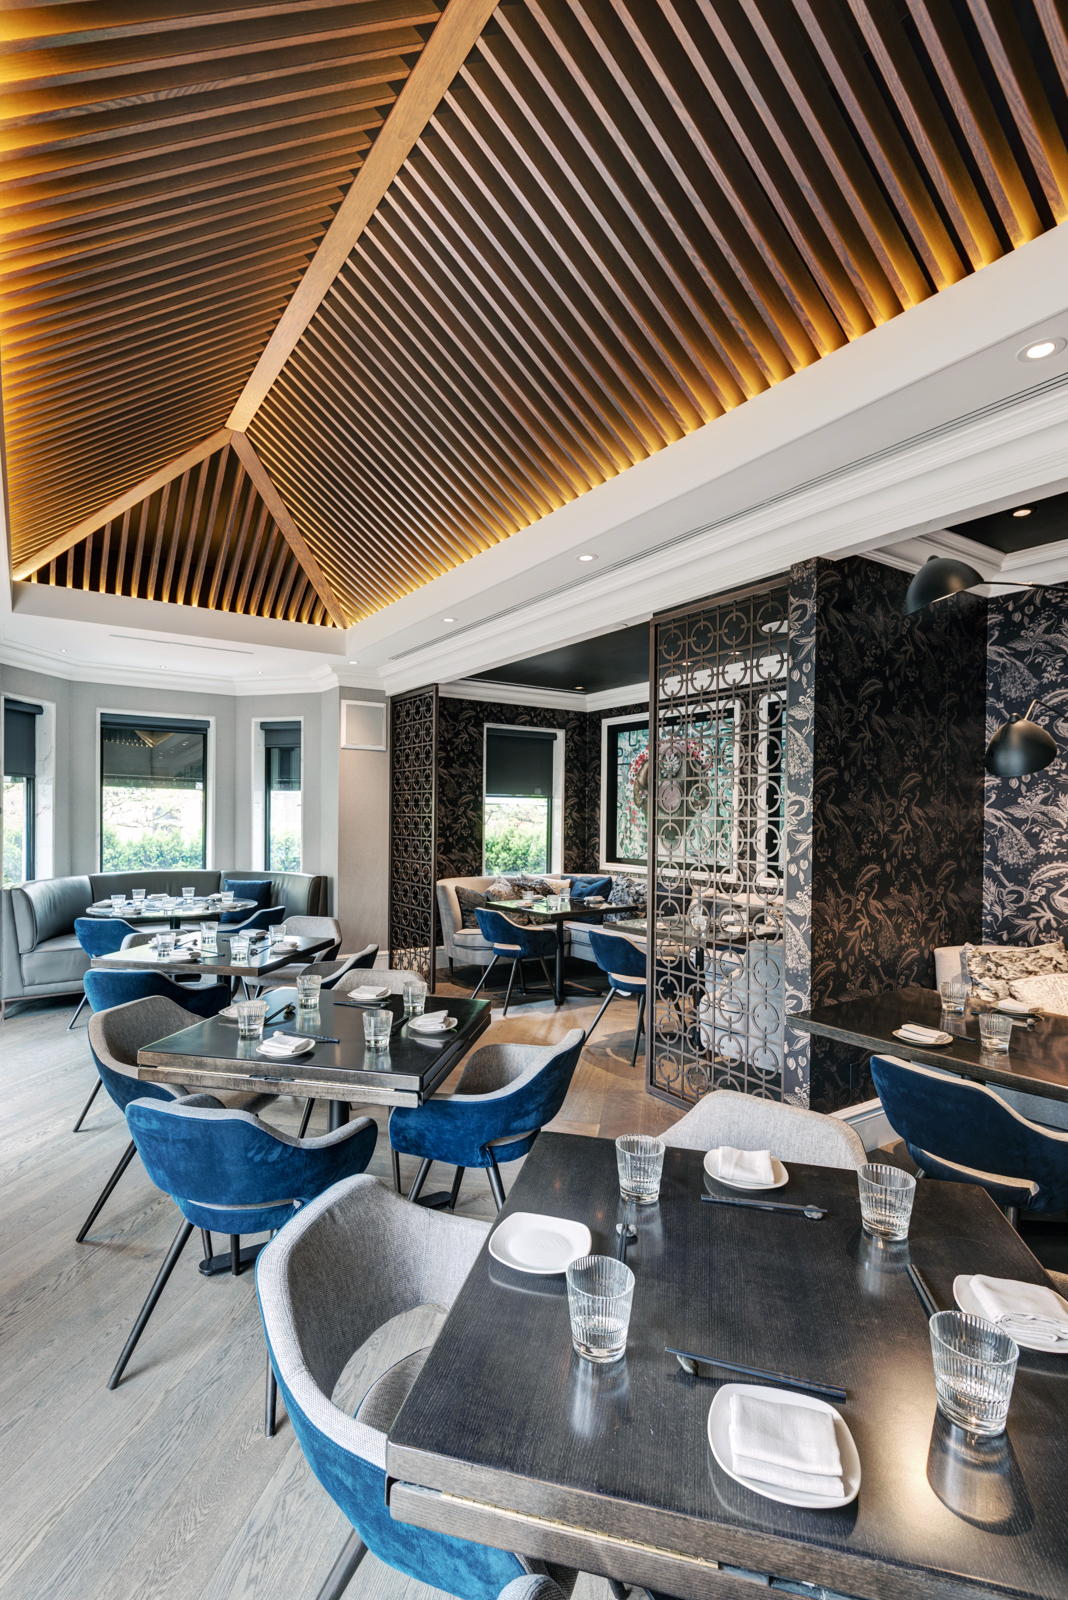 Kasa Moto Restaurant Interior Design Ii By Iv Designii